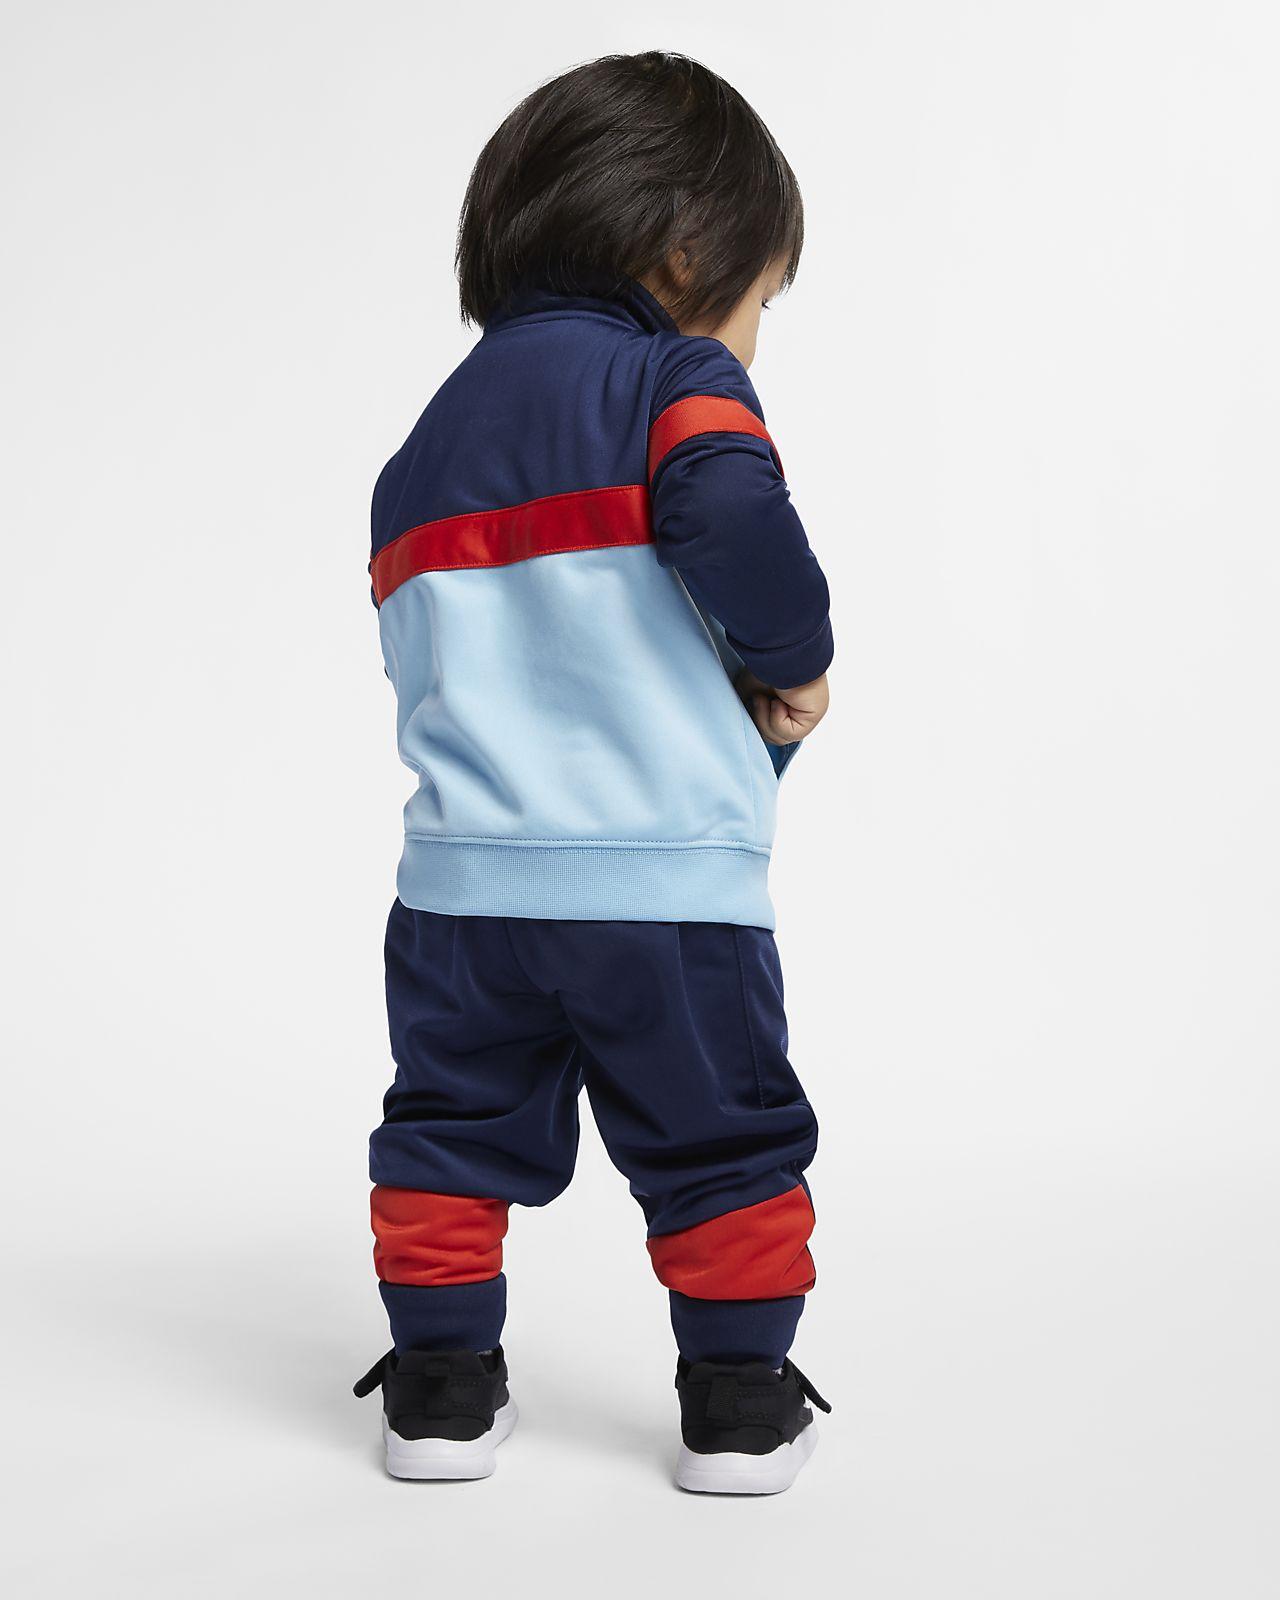 963048b93dd4e Nike Sportswear Baby (12-24M) 2-Piece Set. Nike.com